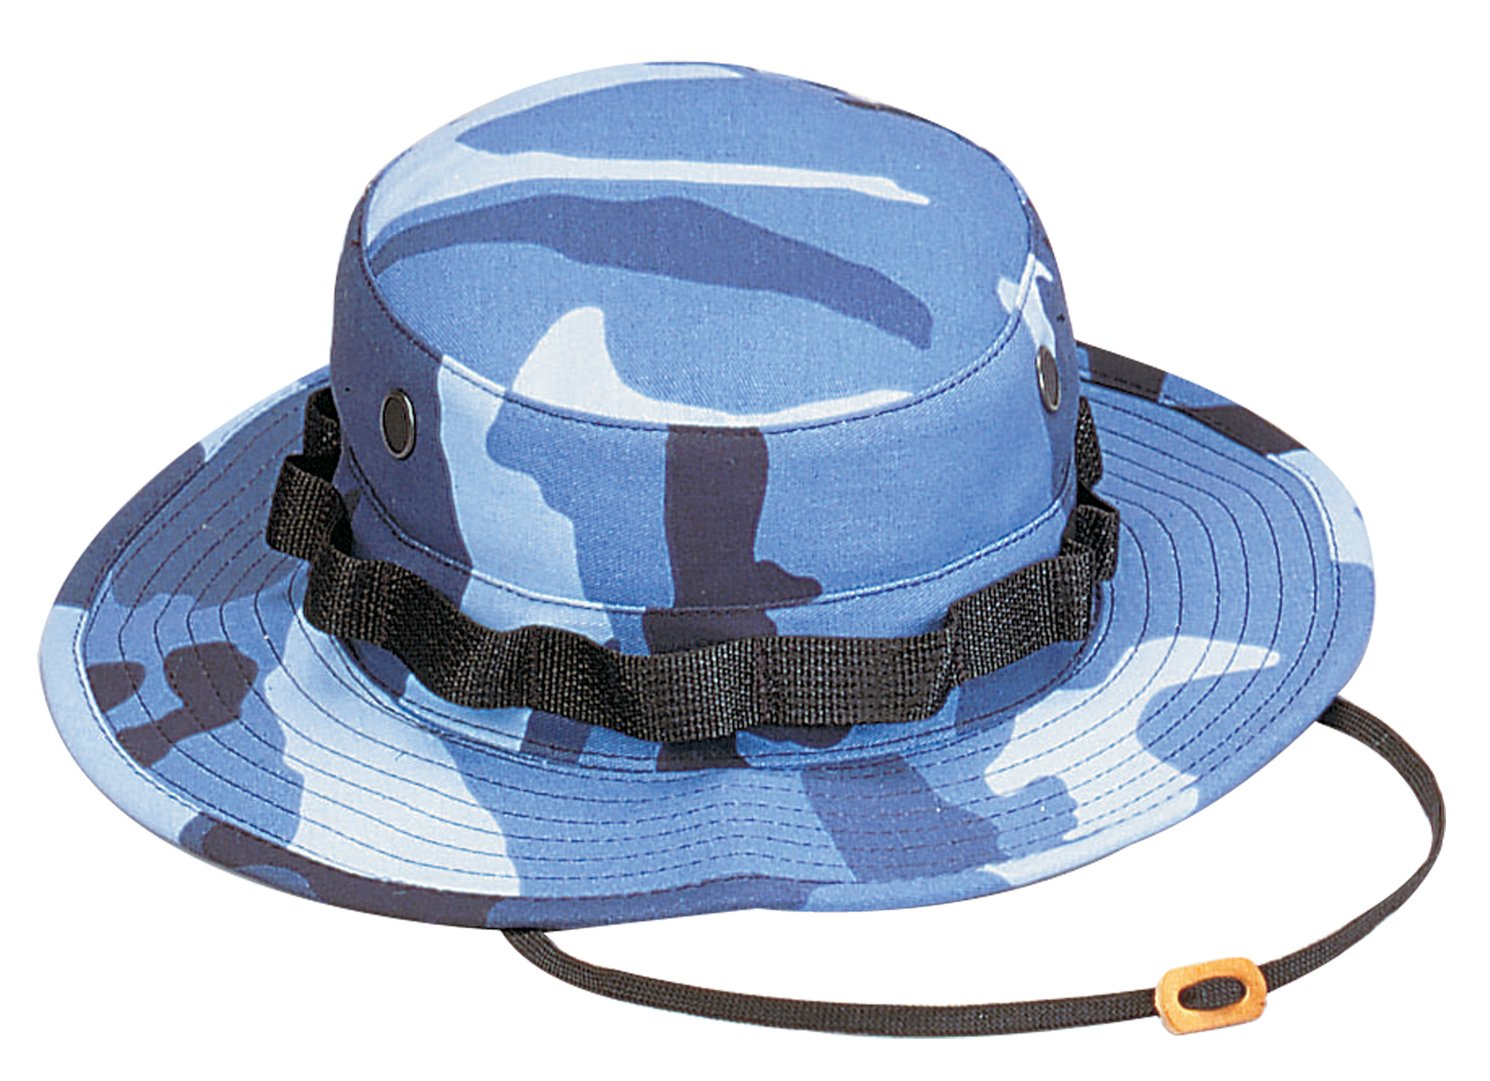 Rothco Boonie Hat Sky Camo - (7 1/2) Inch